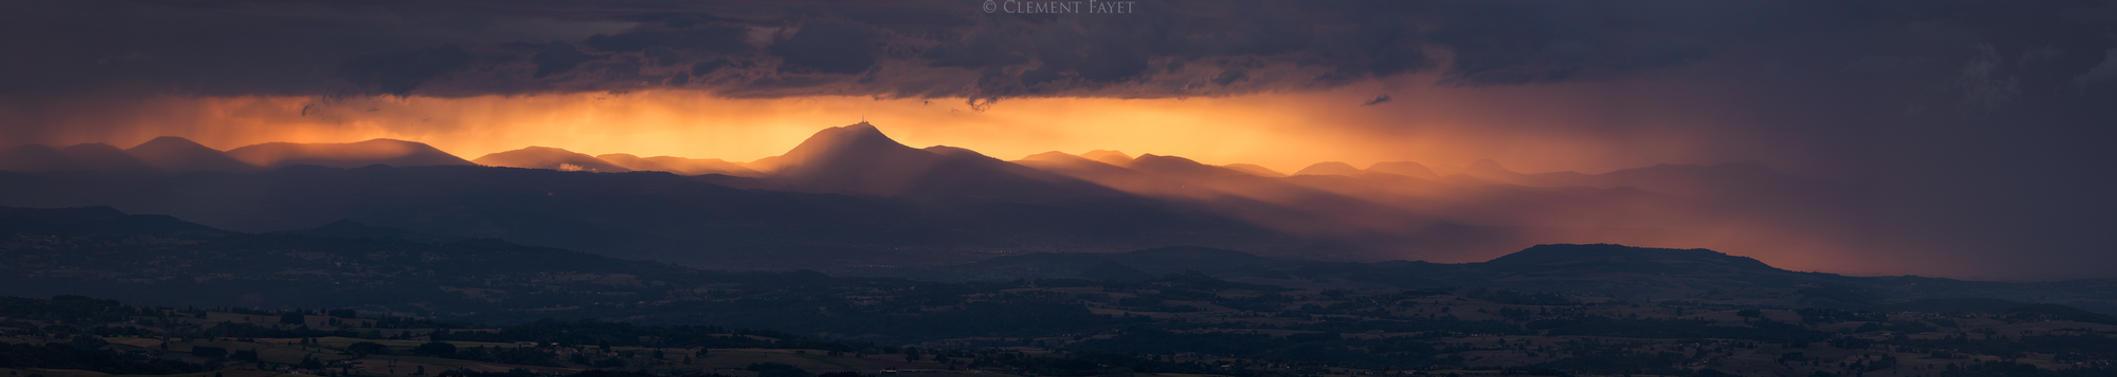 Volcanoes by LG77